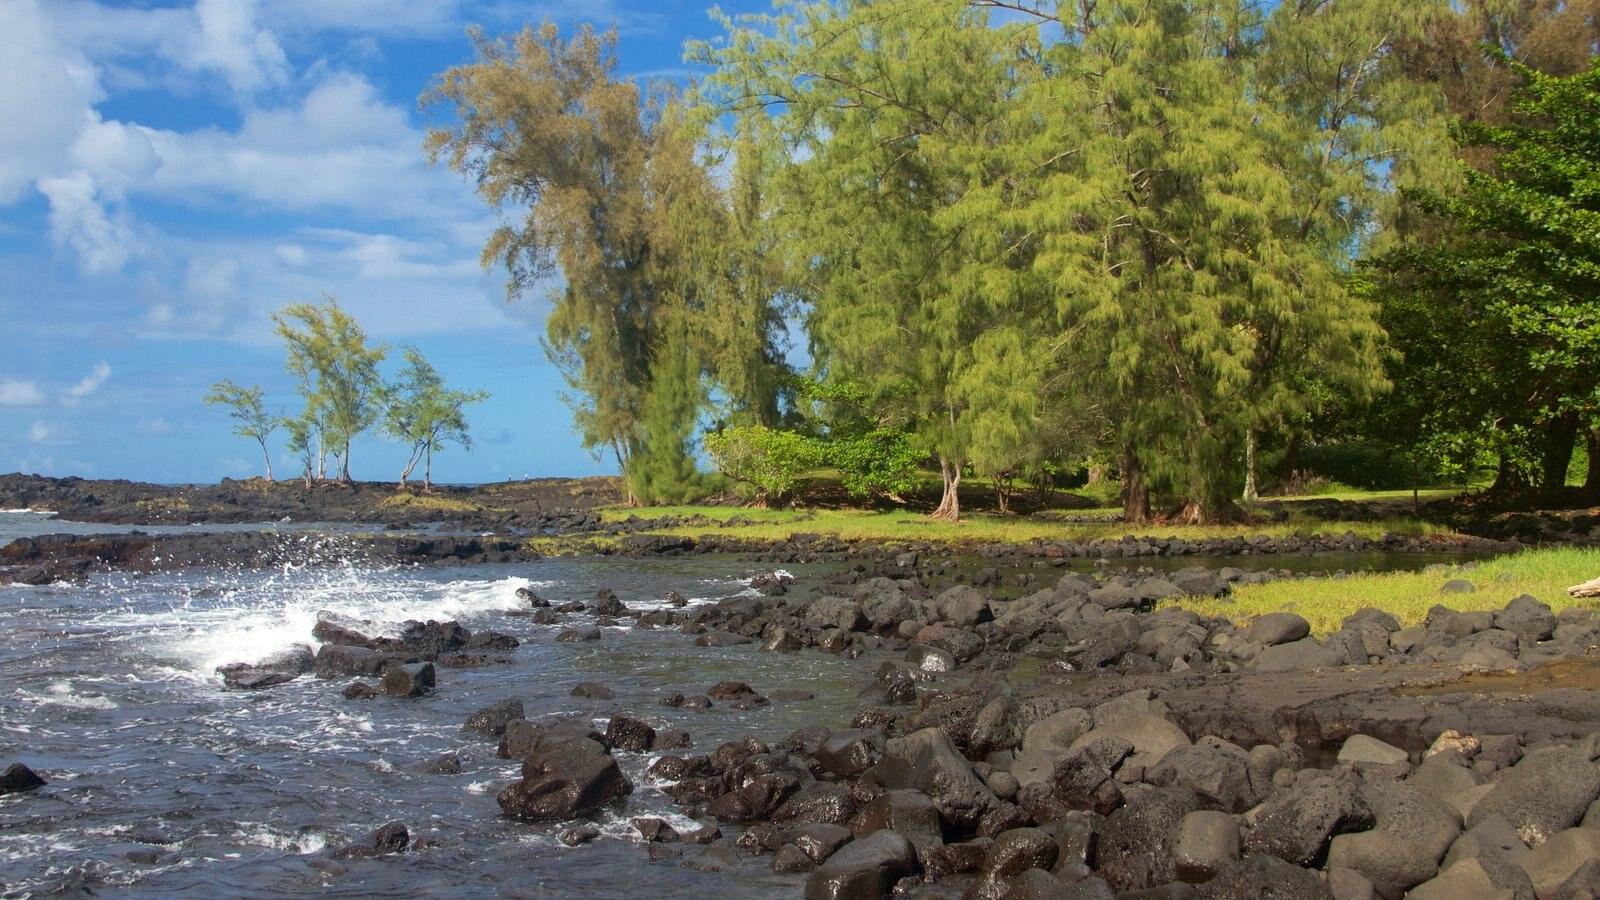 Keaukaha Beach Park caracterizando litoral acidentado